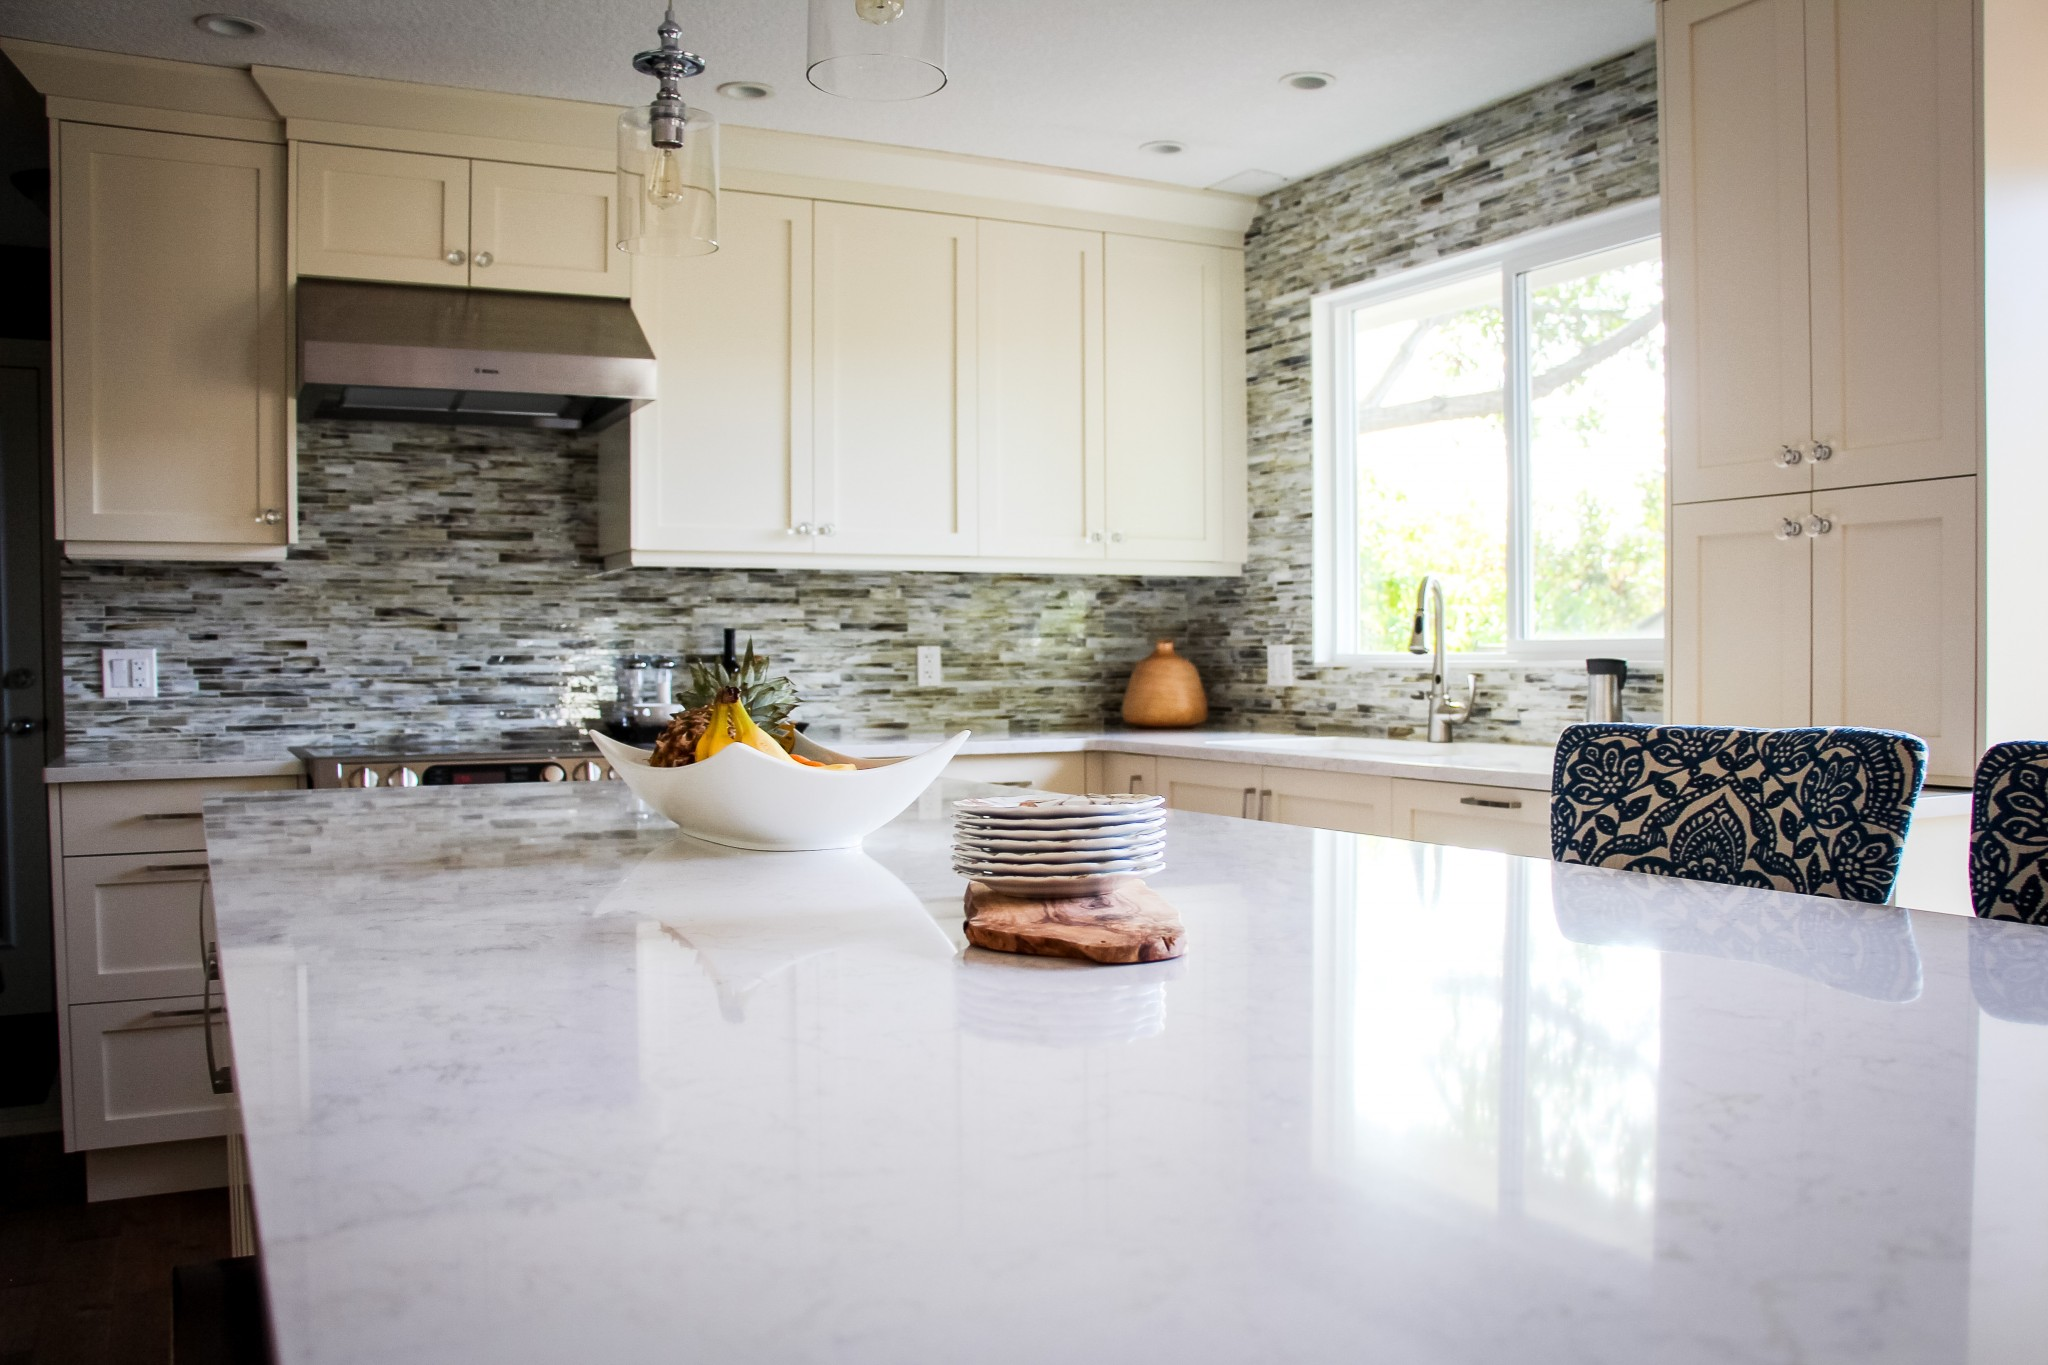 Luxe Kitchen Remodel - Karen Fron Interior Design | Calgary